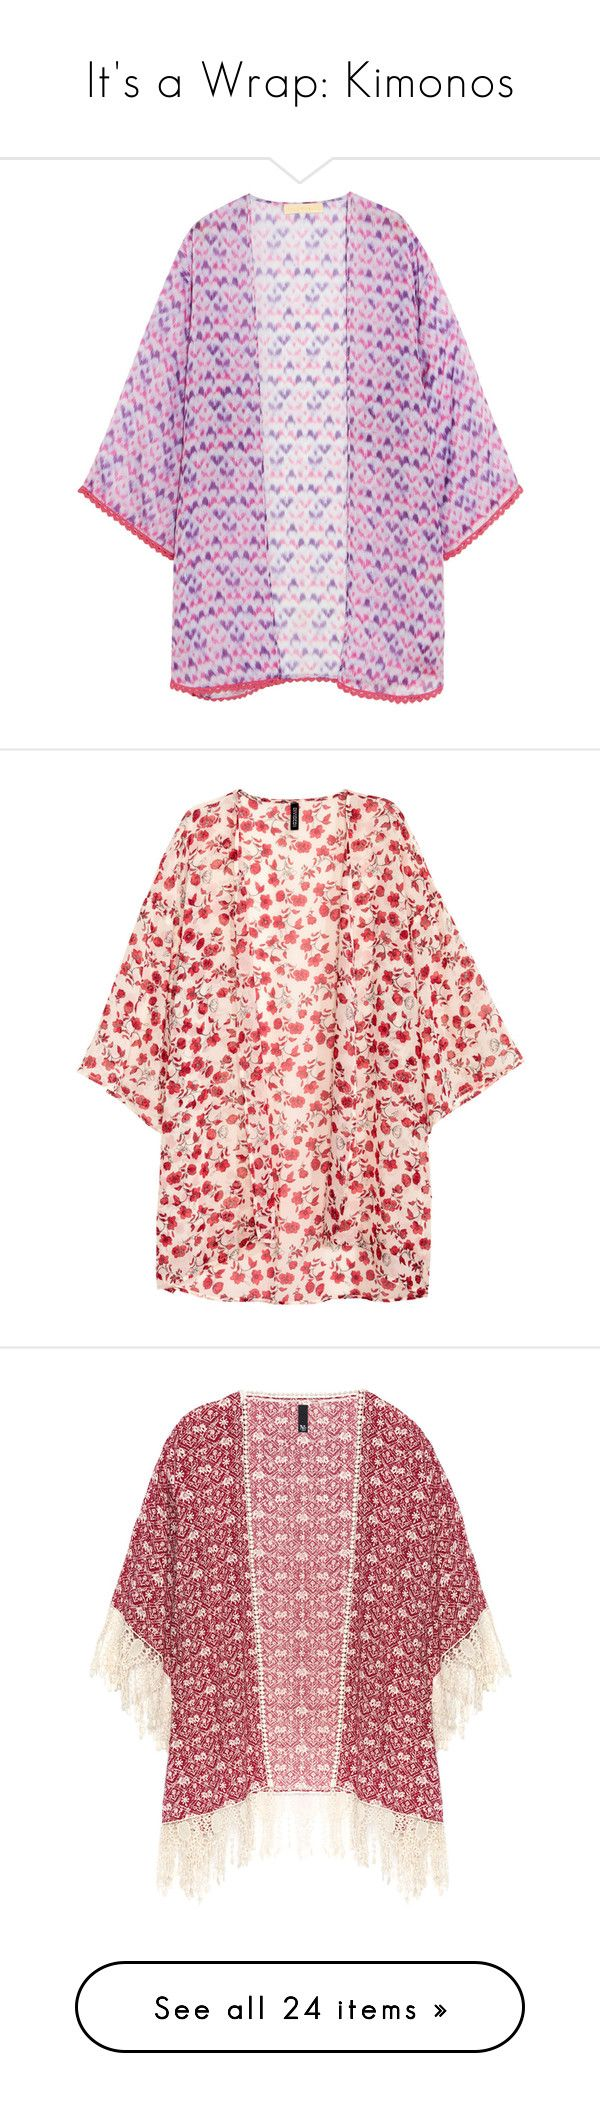 """It's a Wrap: Kimonos"" by polyvore-editorial ❤ liked on Polyvore featuring kimonos, intimates, robes, purple, purple robe, beach slip, beach kaftan, kimono robe, beach kimono and kimono"